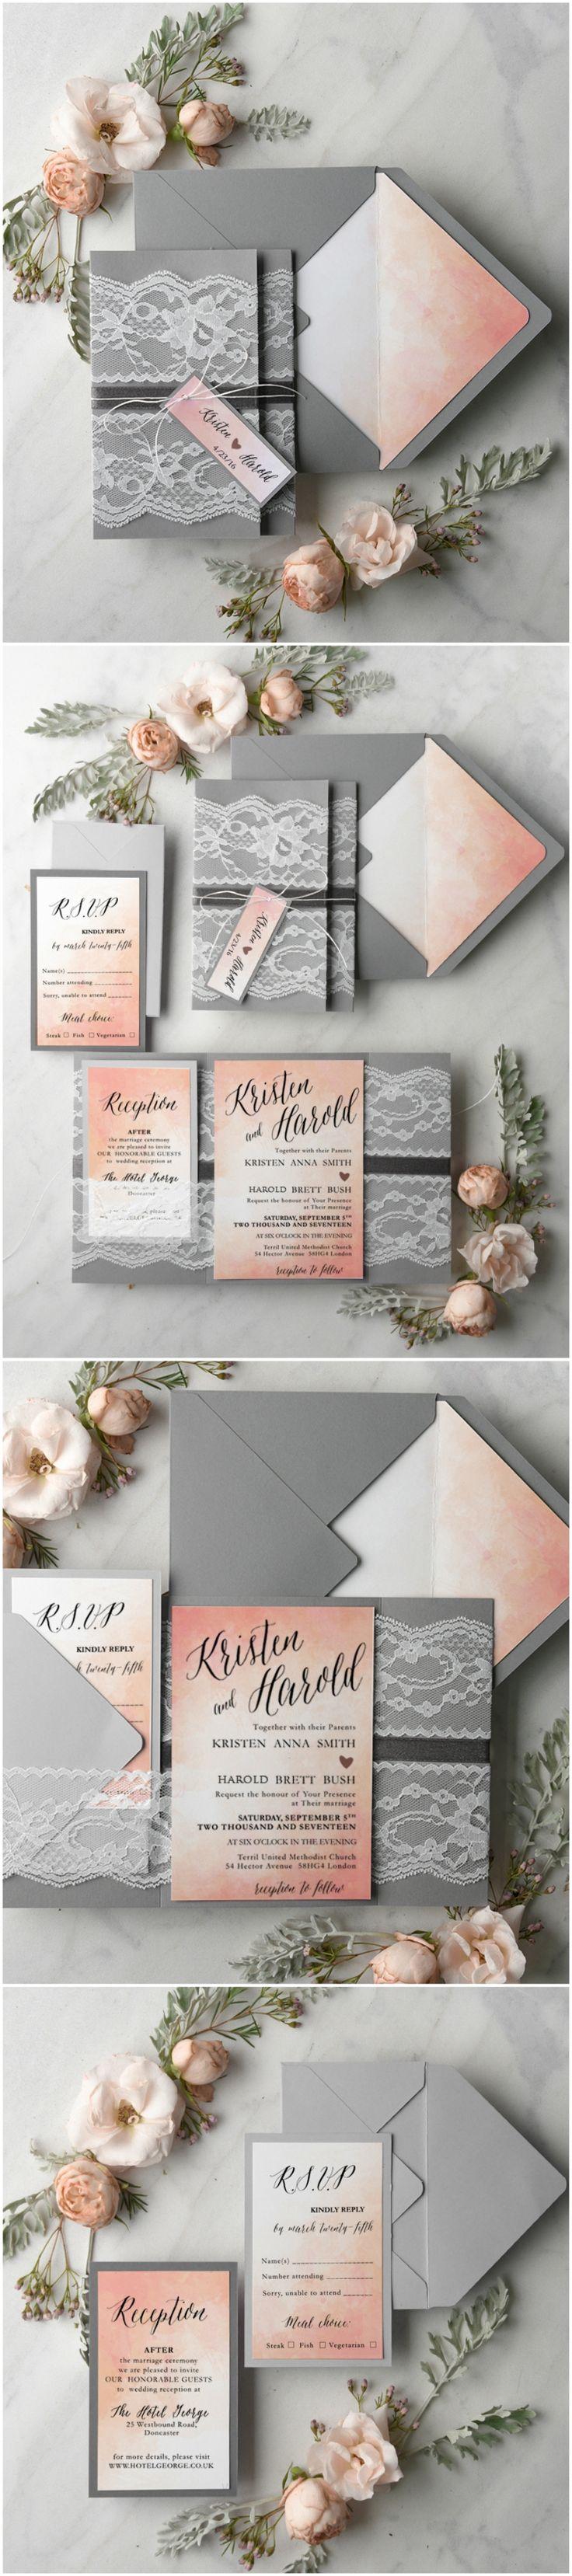 Ombre Lace Romantic Wedding Invitations #ombre #peach #romantic #elegant #wedddingideas #stationery #weddinginvitations